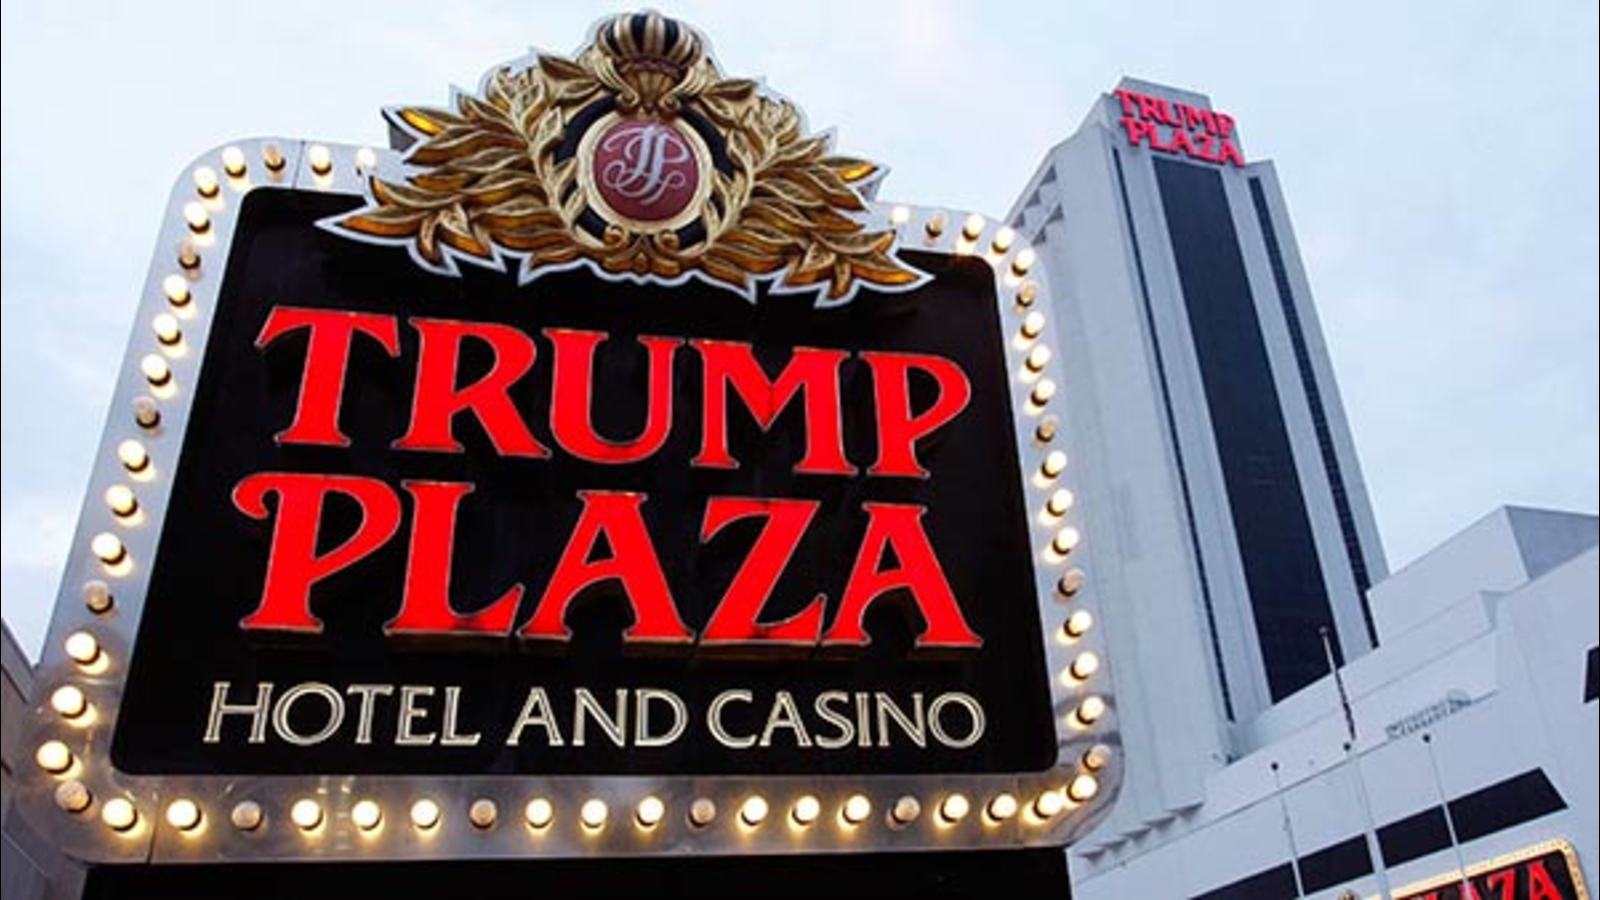 Donald Trump Plaza Hotel